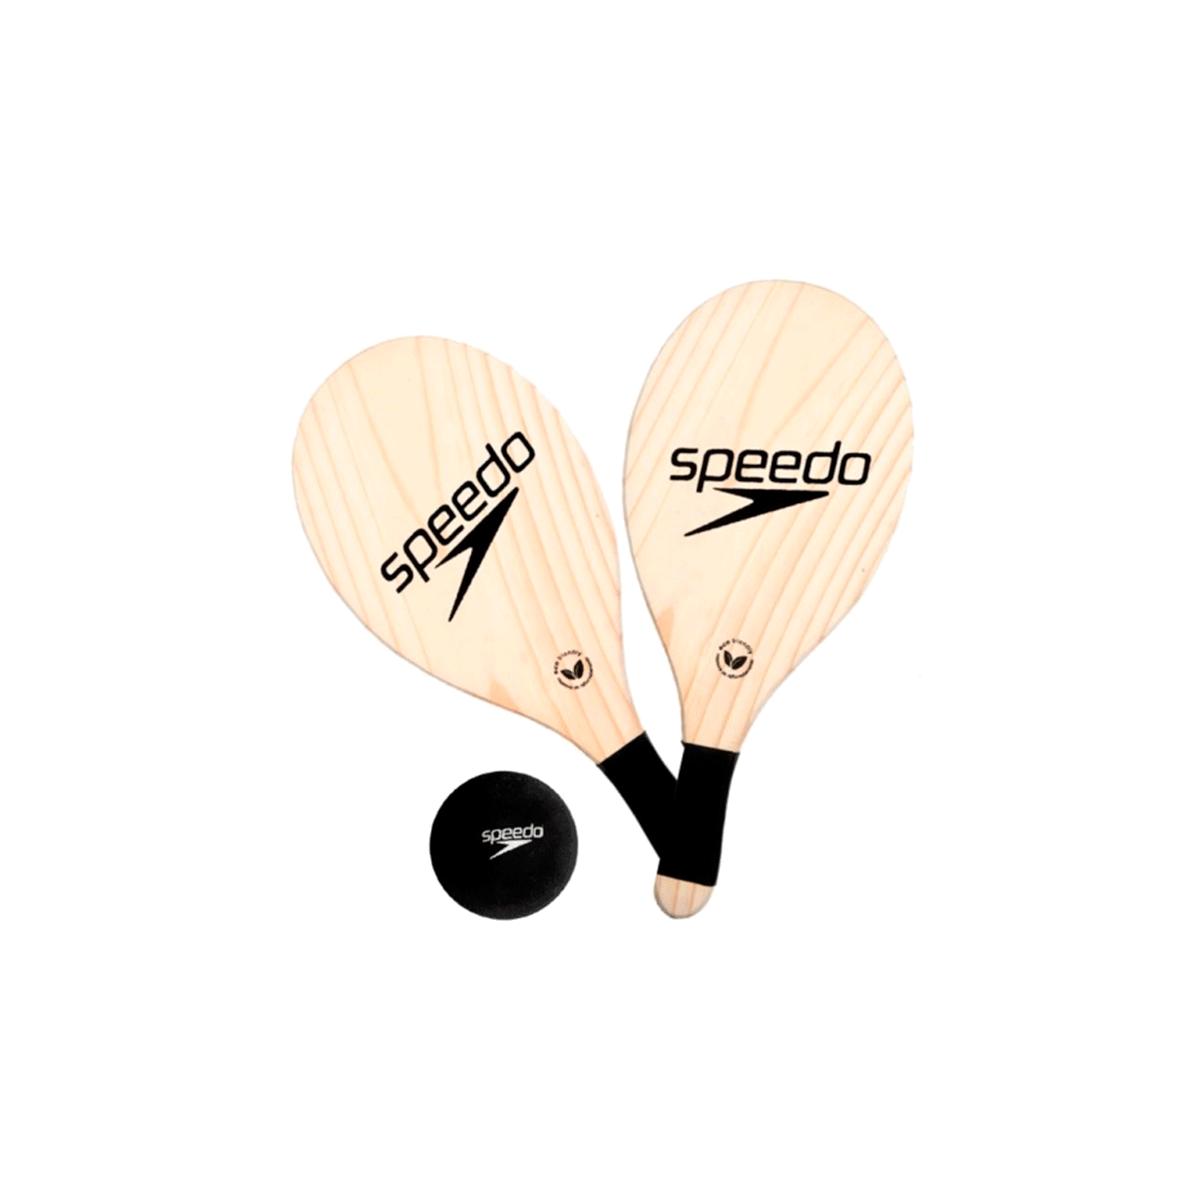 Kit Frescobol Speedo 2 Raquetes e Bola Preto